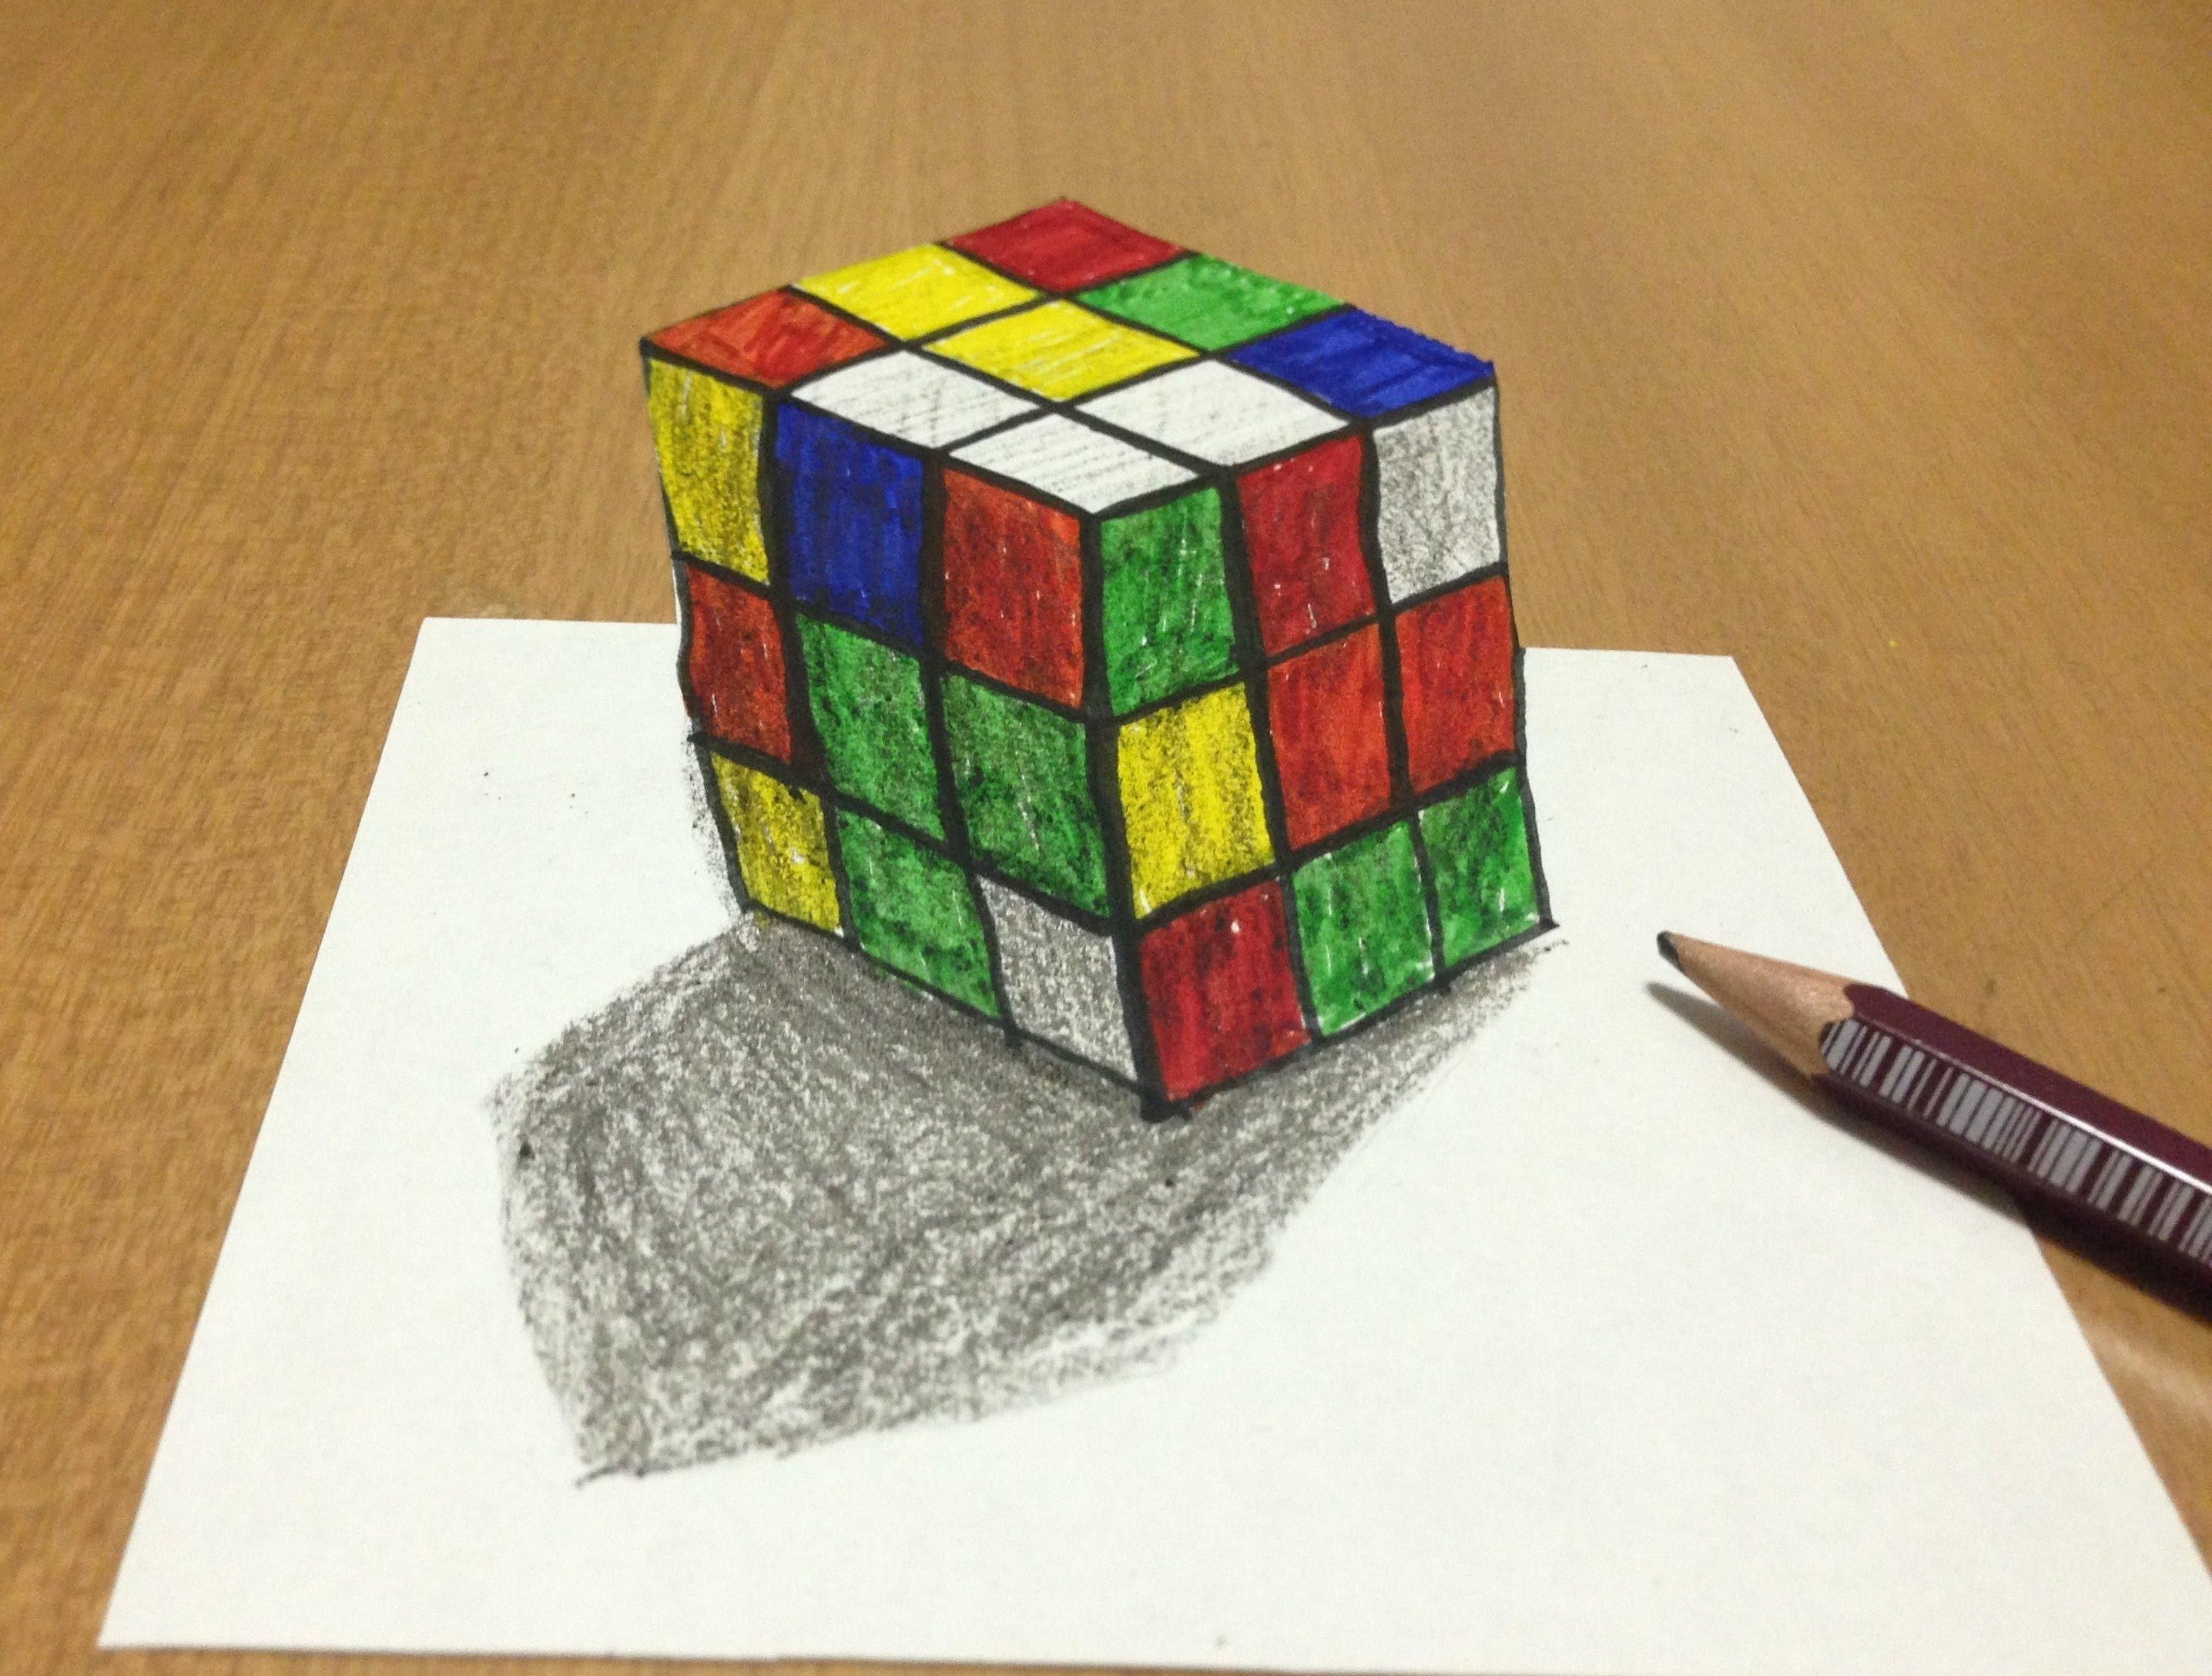 Drawn optical illusion cube Illusion Art Cube 3D Drawing